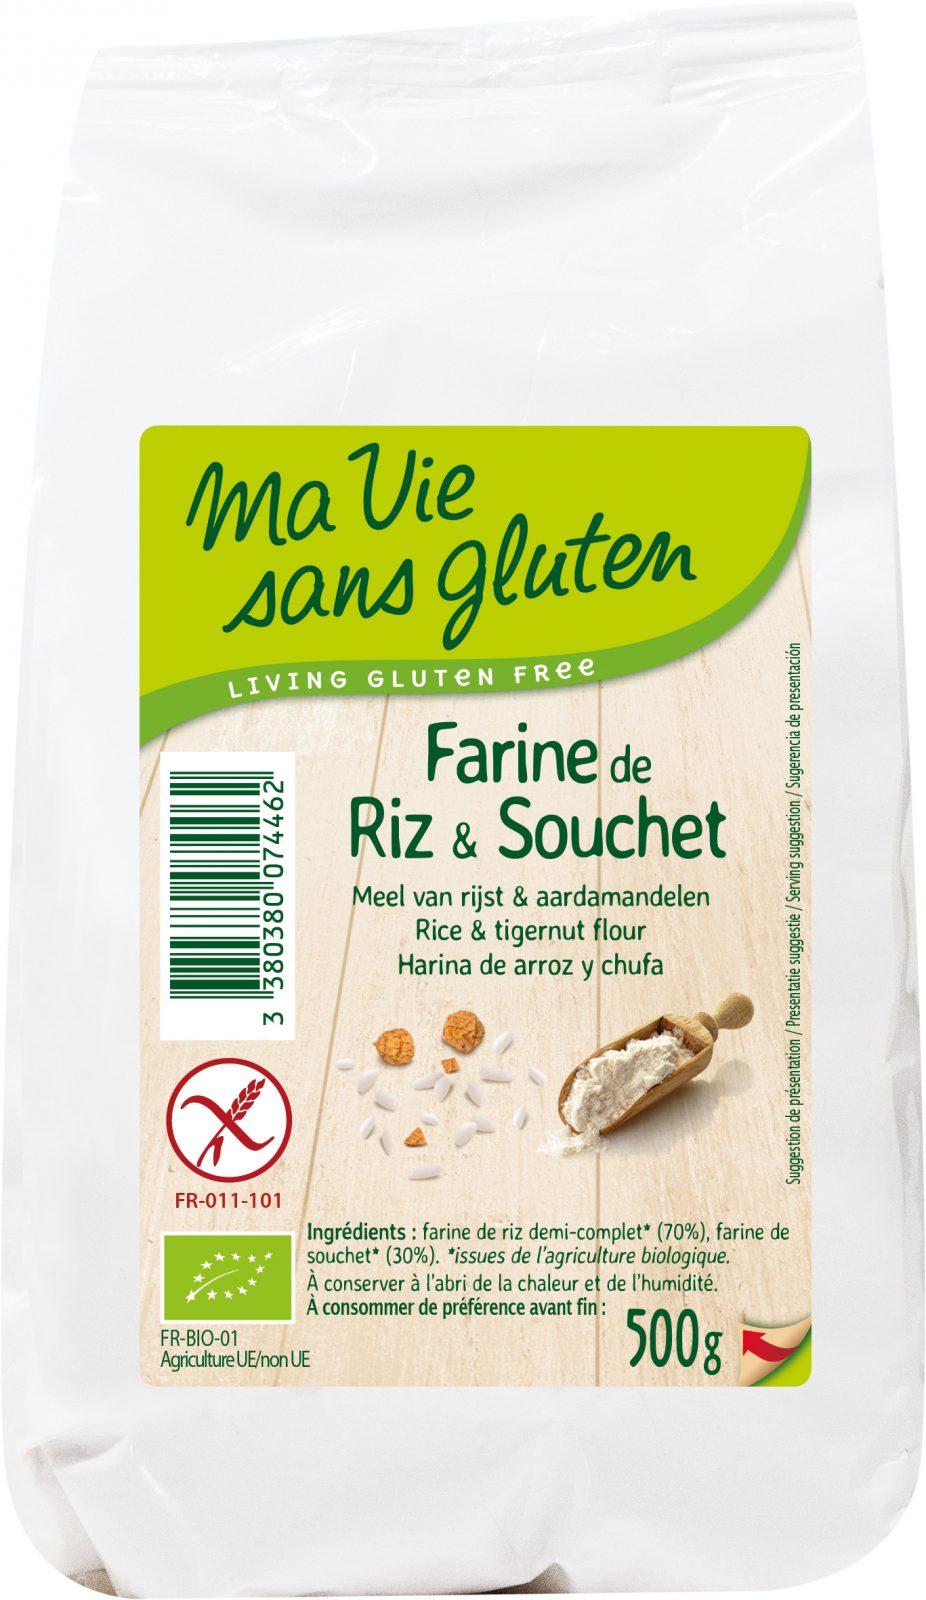 MVSG - farines - Farine bio de riz et souchet 500g